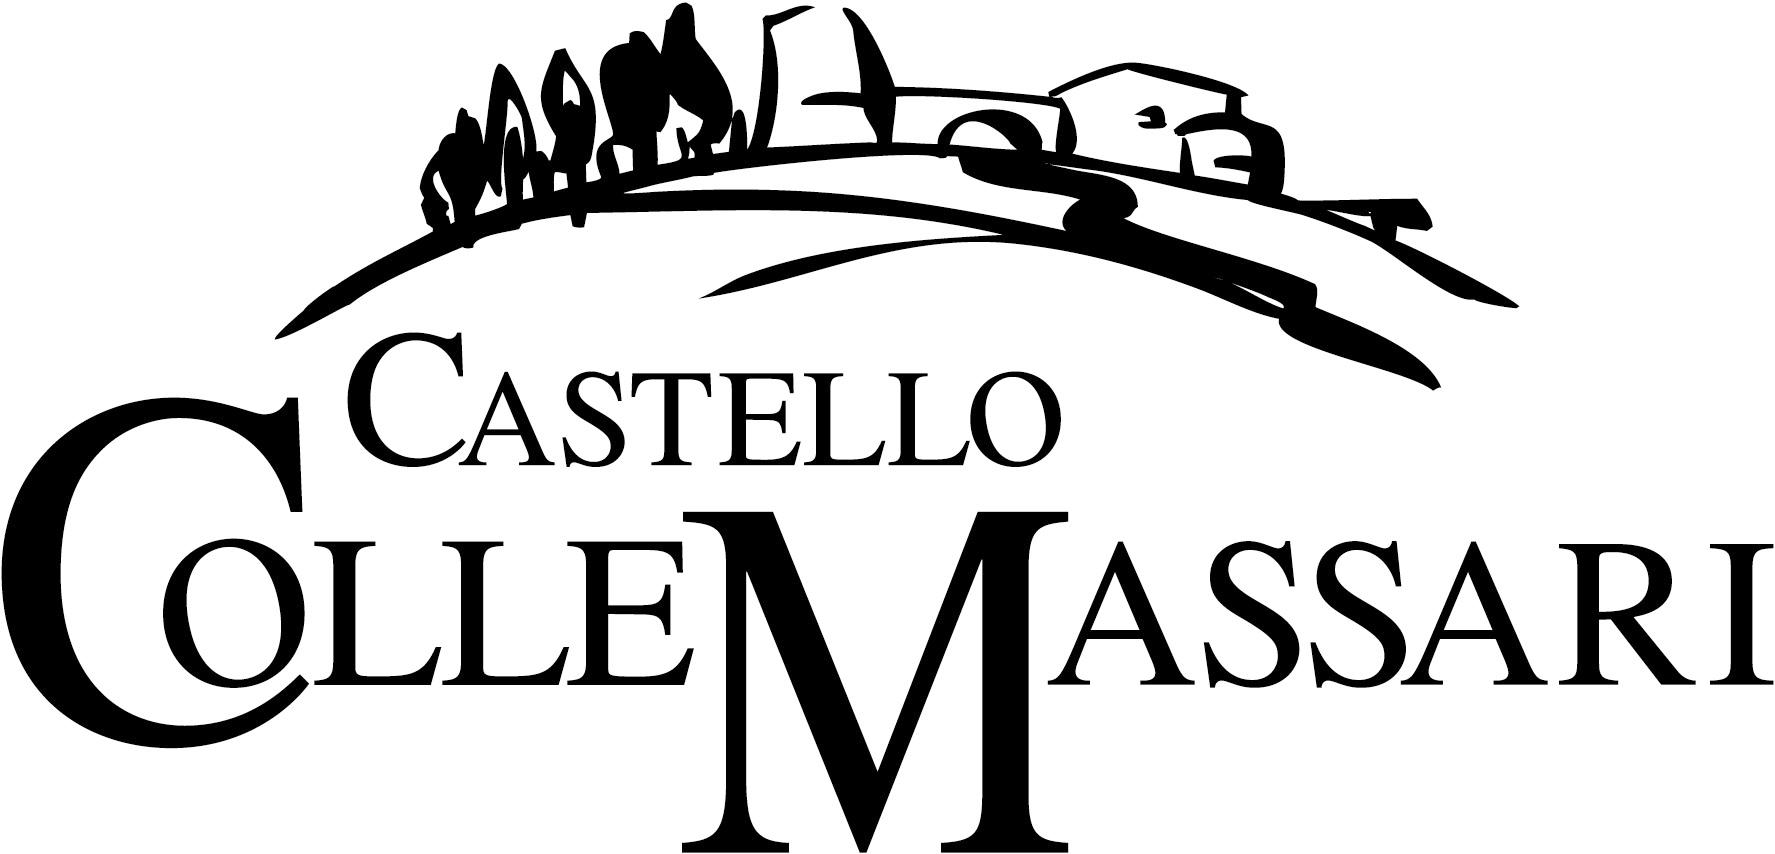 CASTELLO COLLE MASSARI/コッレマッサーリ